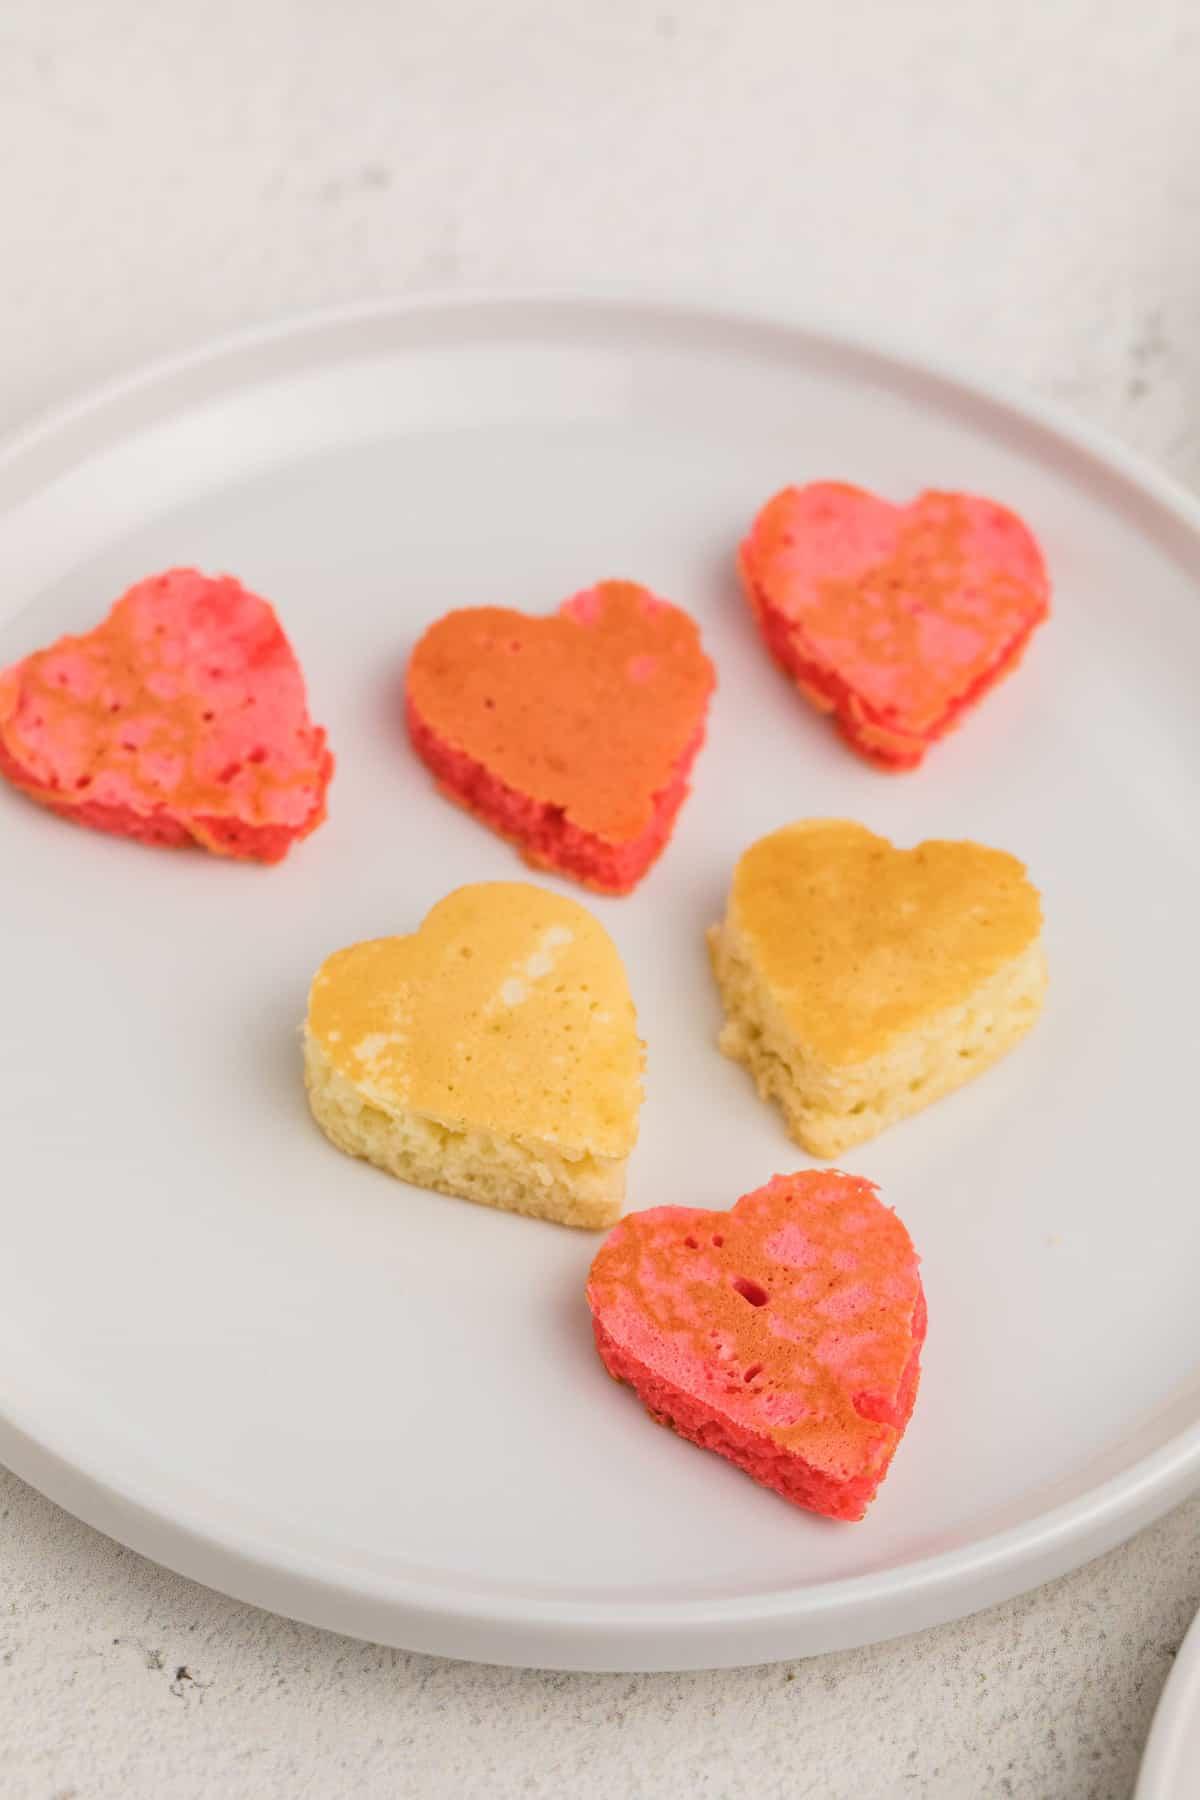 Tiny heart-shaped pancakes on a plate.